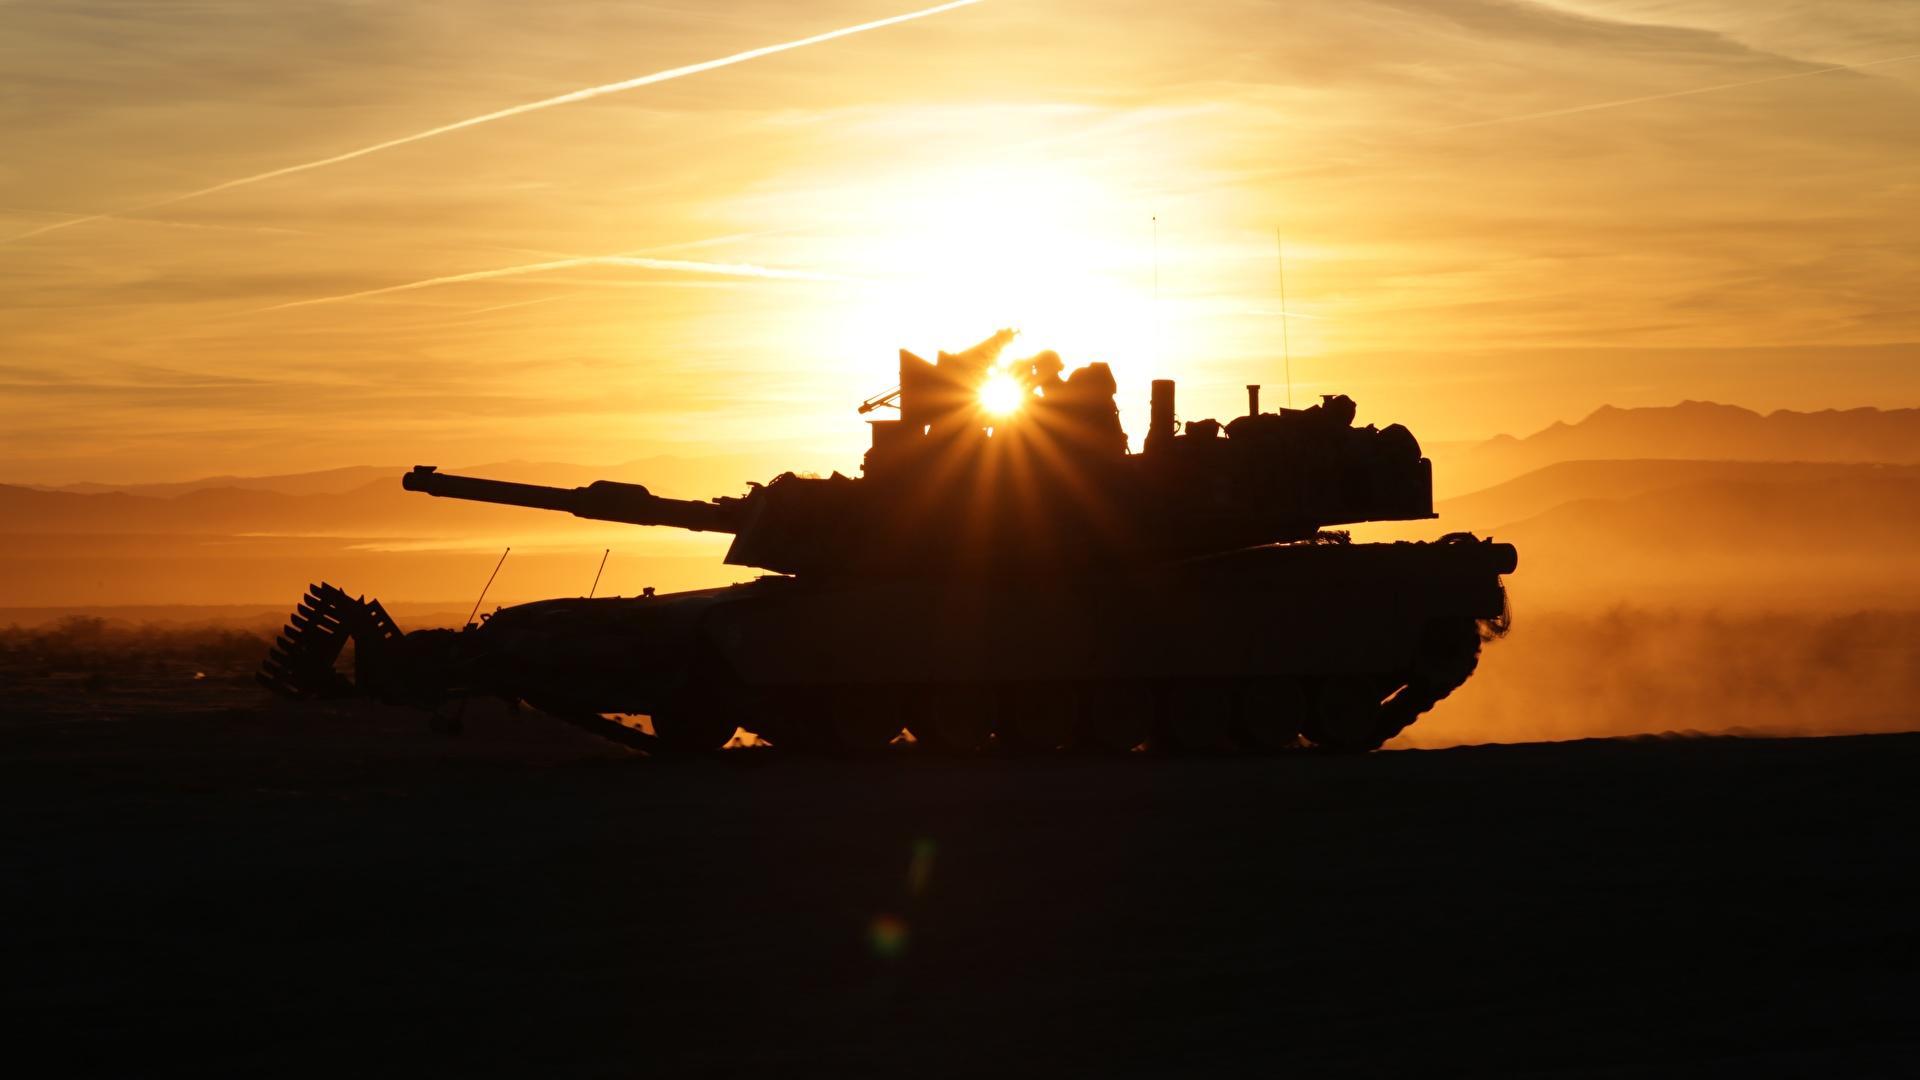 Картинка Лучи света Абрамс М1 Танки силуэта M1A2 Армия 1920x1080 танк Силуэт силуэты военные